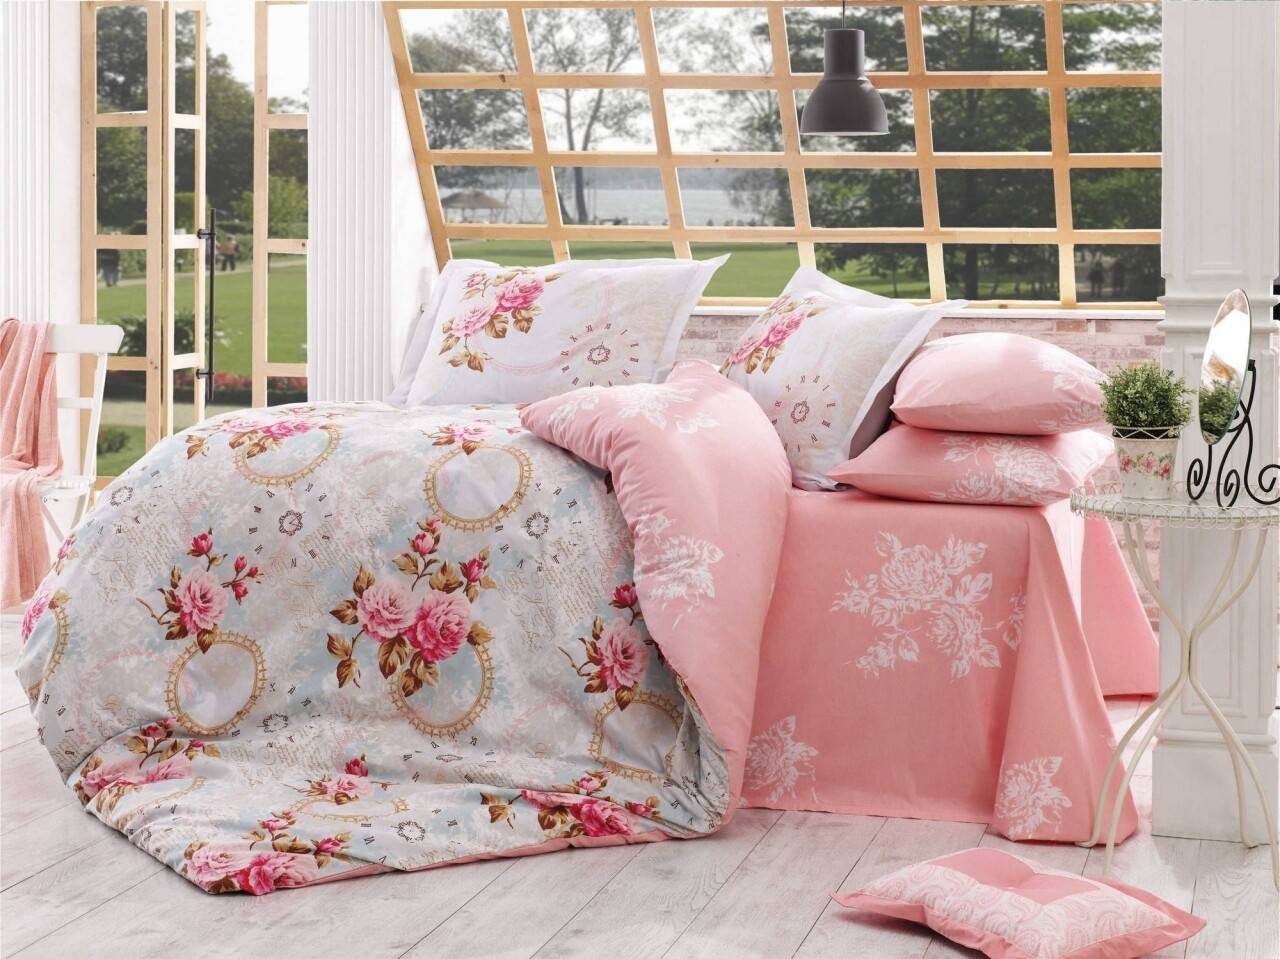 Lenjerie de pat pentru o persoana, 3 piese, 100% bumbac poplin, Hobby, Clementina, roz